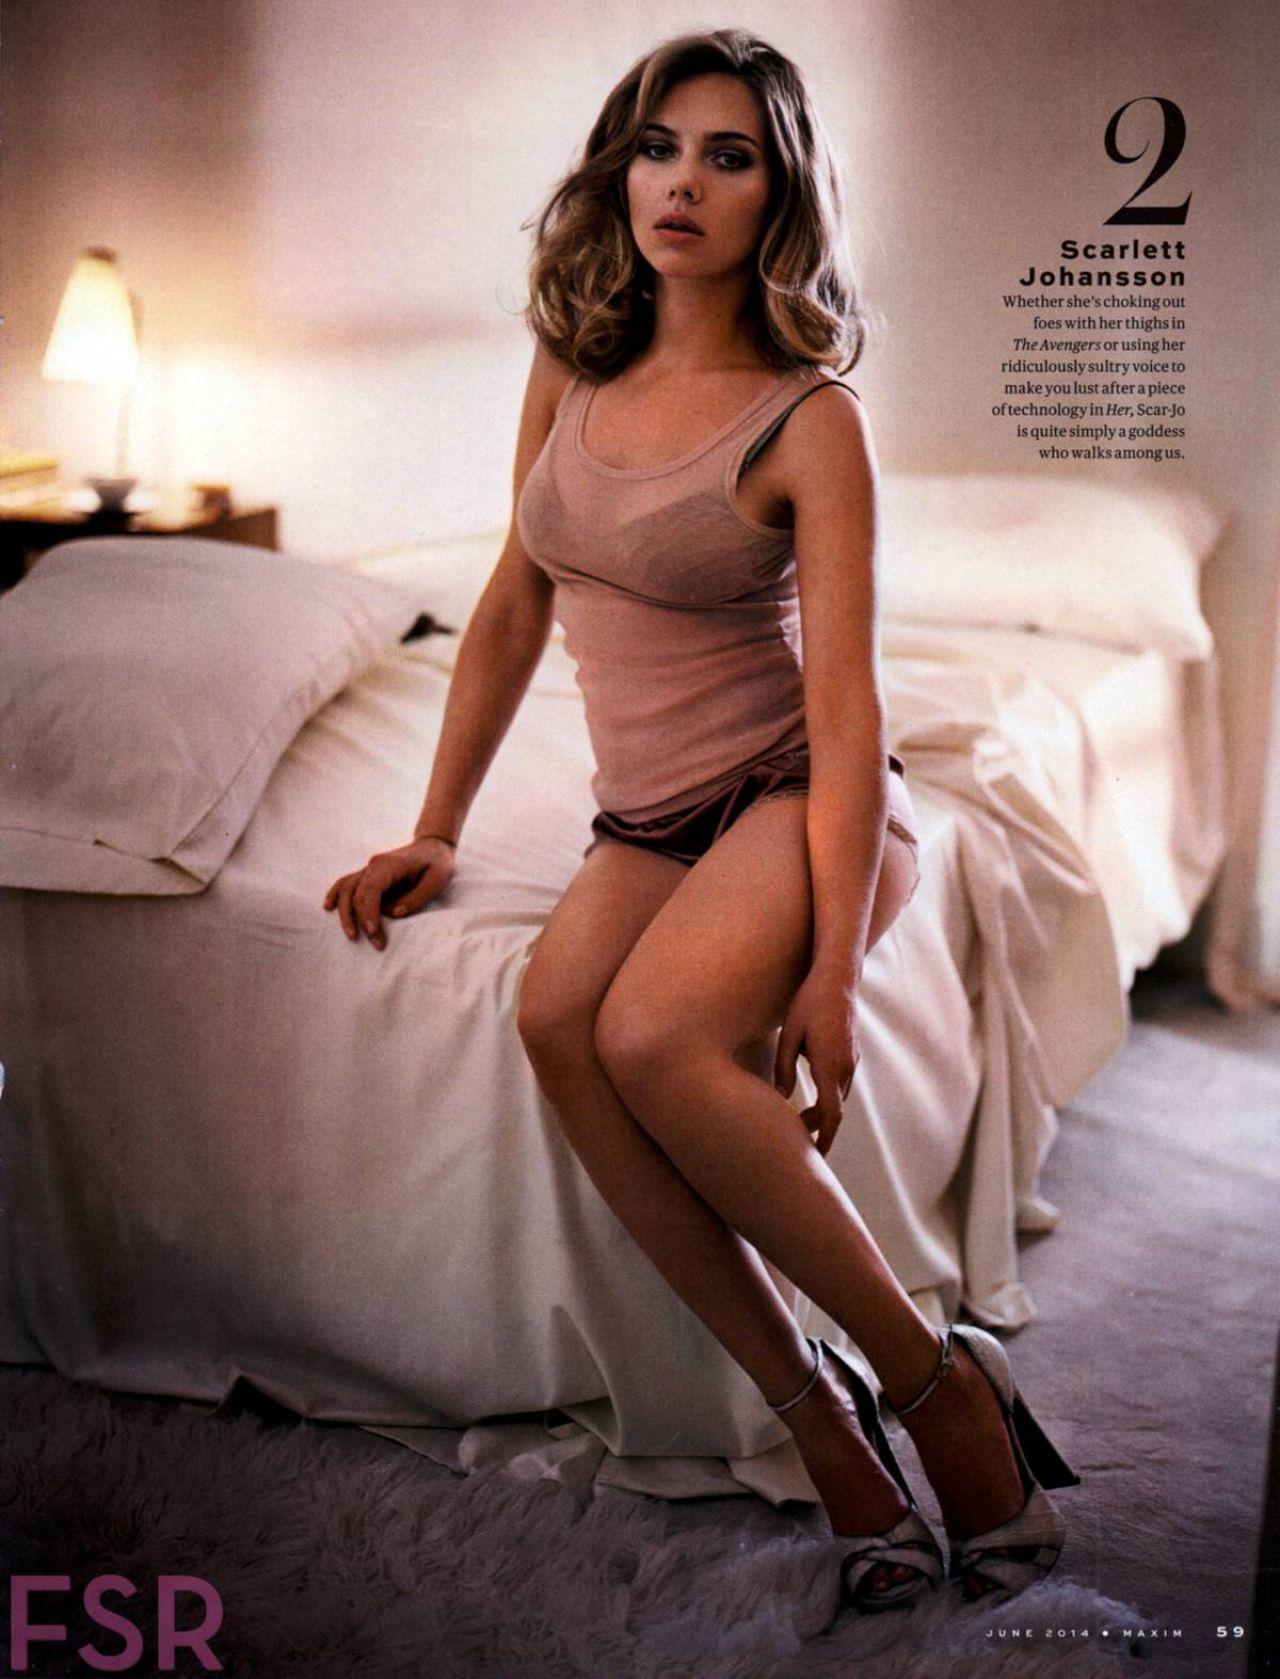 TOP 10 Celebs - Maxim Magazine HOT 100 (June 2014)